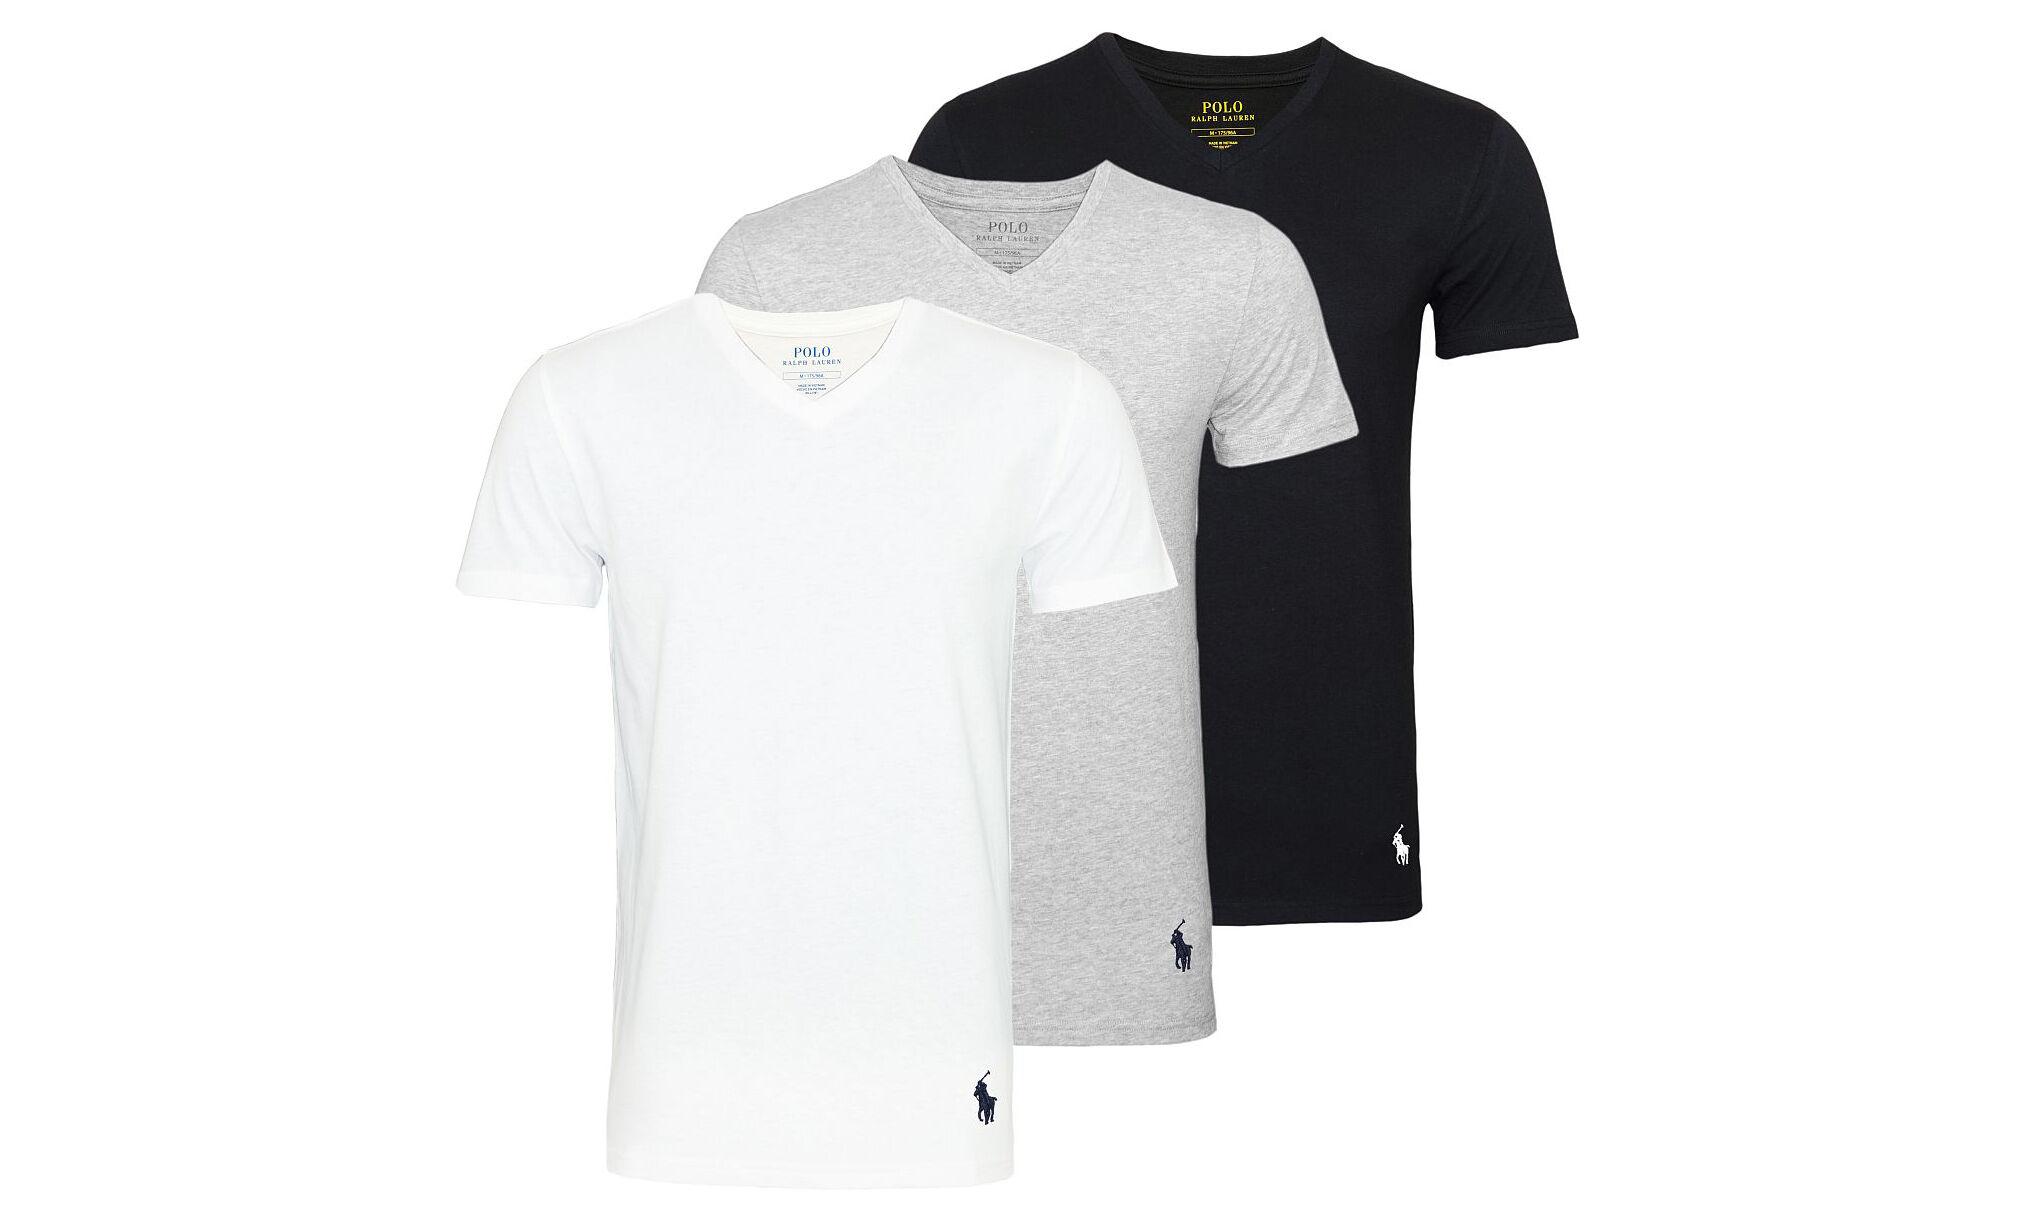 Ralph Lauren Men's Ralph Lauren Three-Pack of T-Shirts: V-Neck Grey, Black, White/XXL